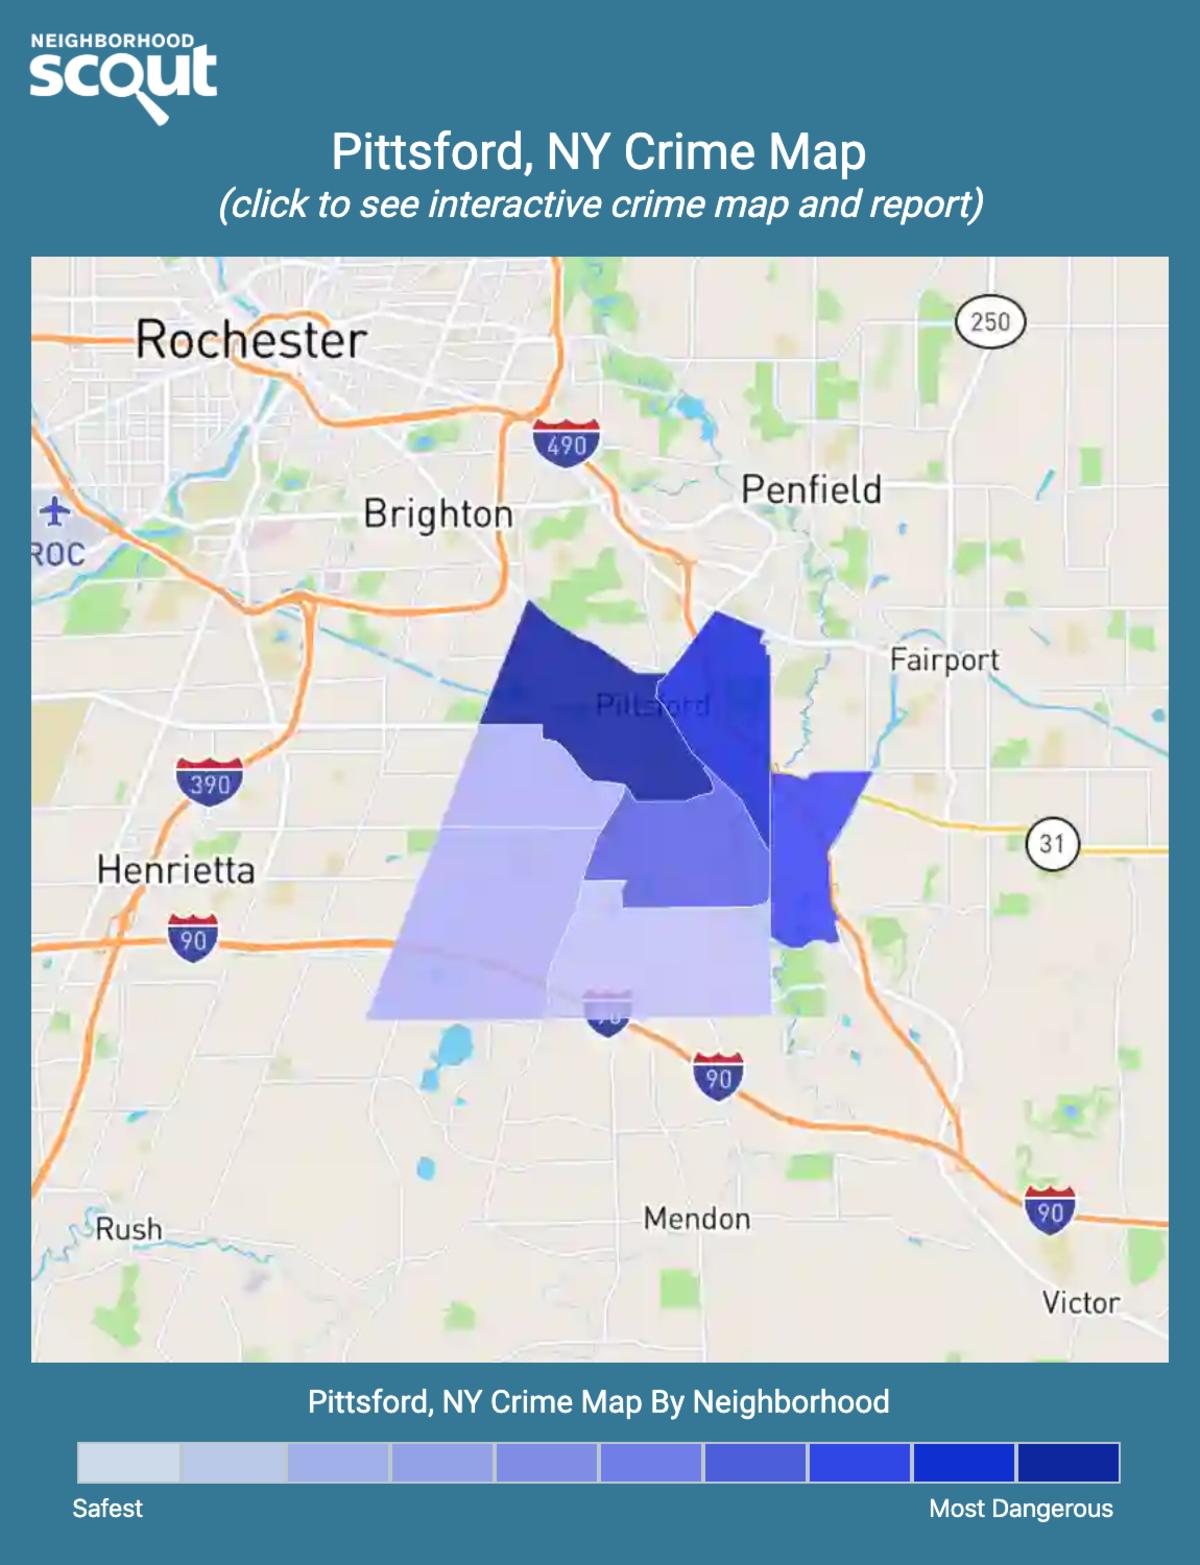 Pittsford, New York crime map